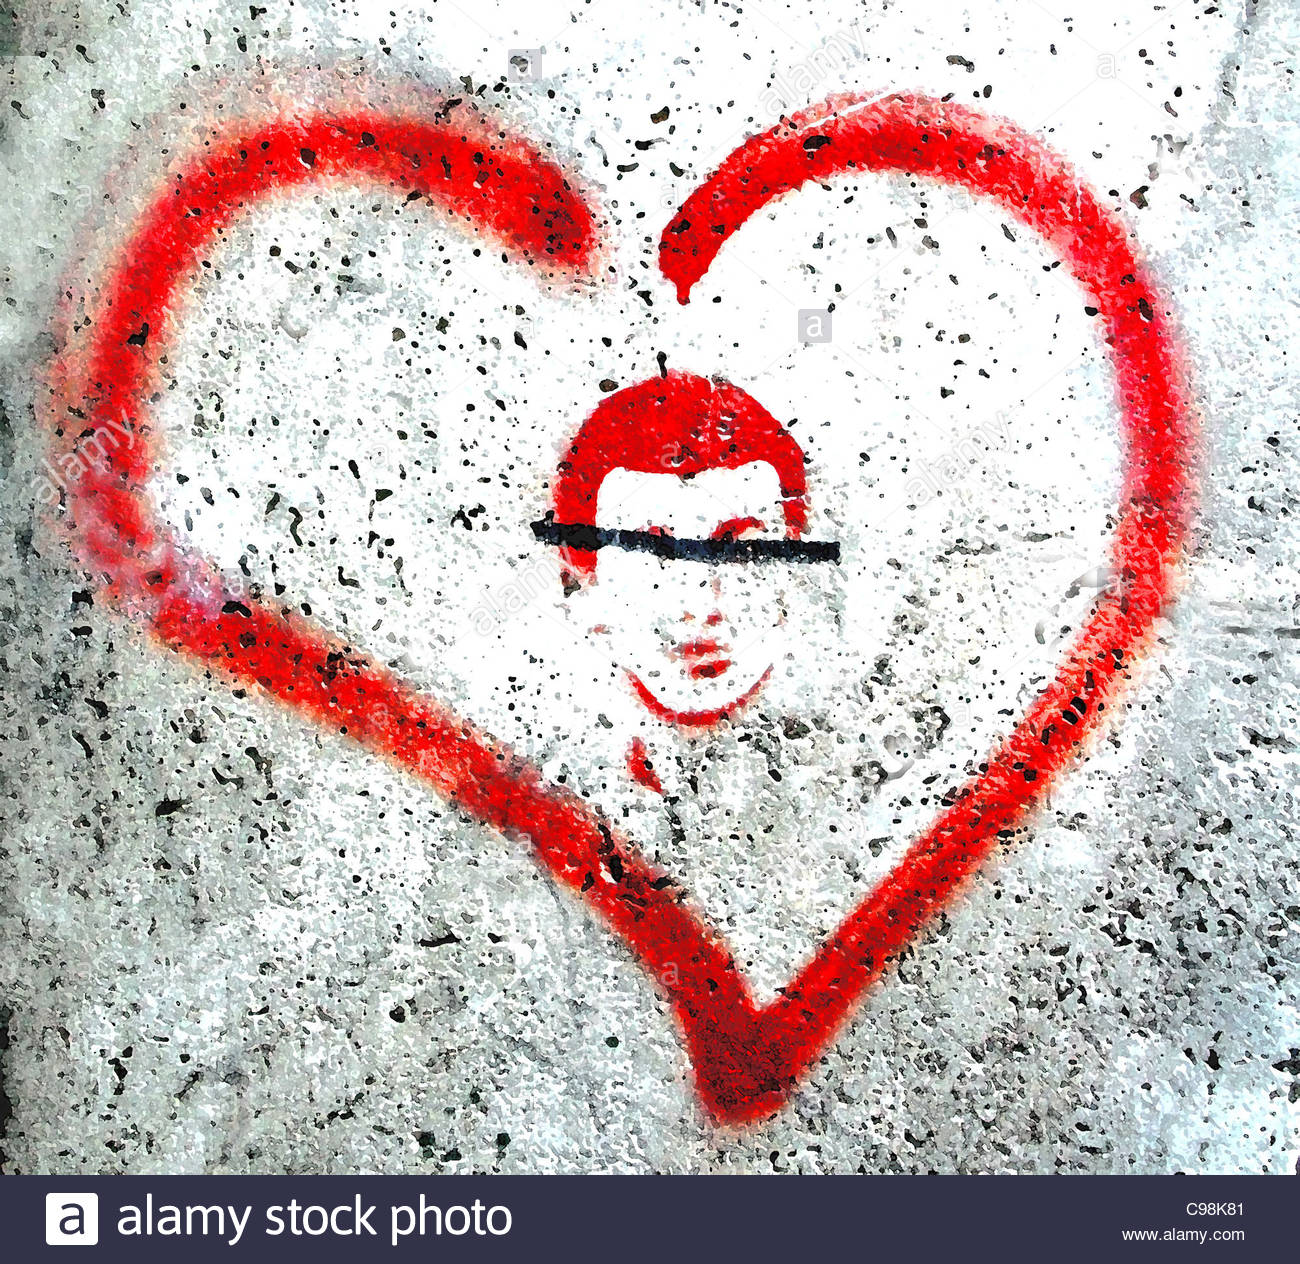 love love loving loving loves love Affection zweisam Togetherness fall love - Stock Image